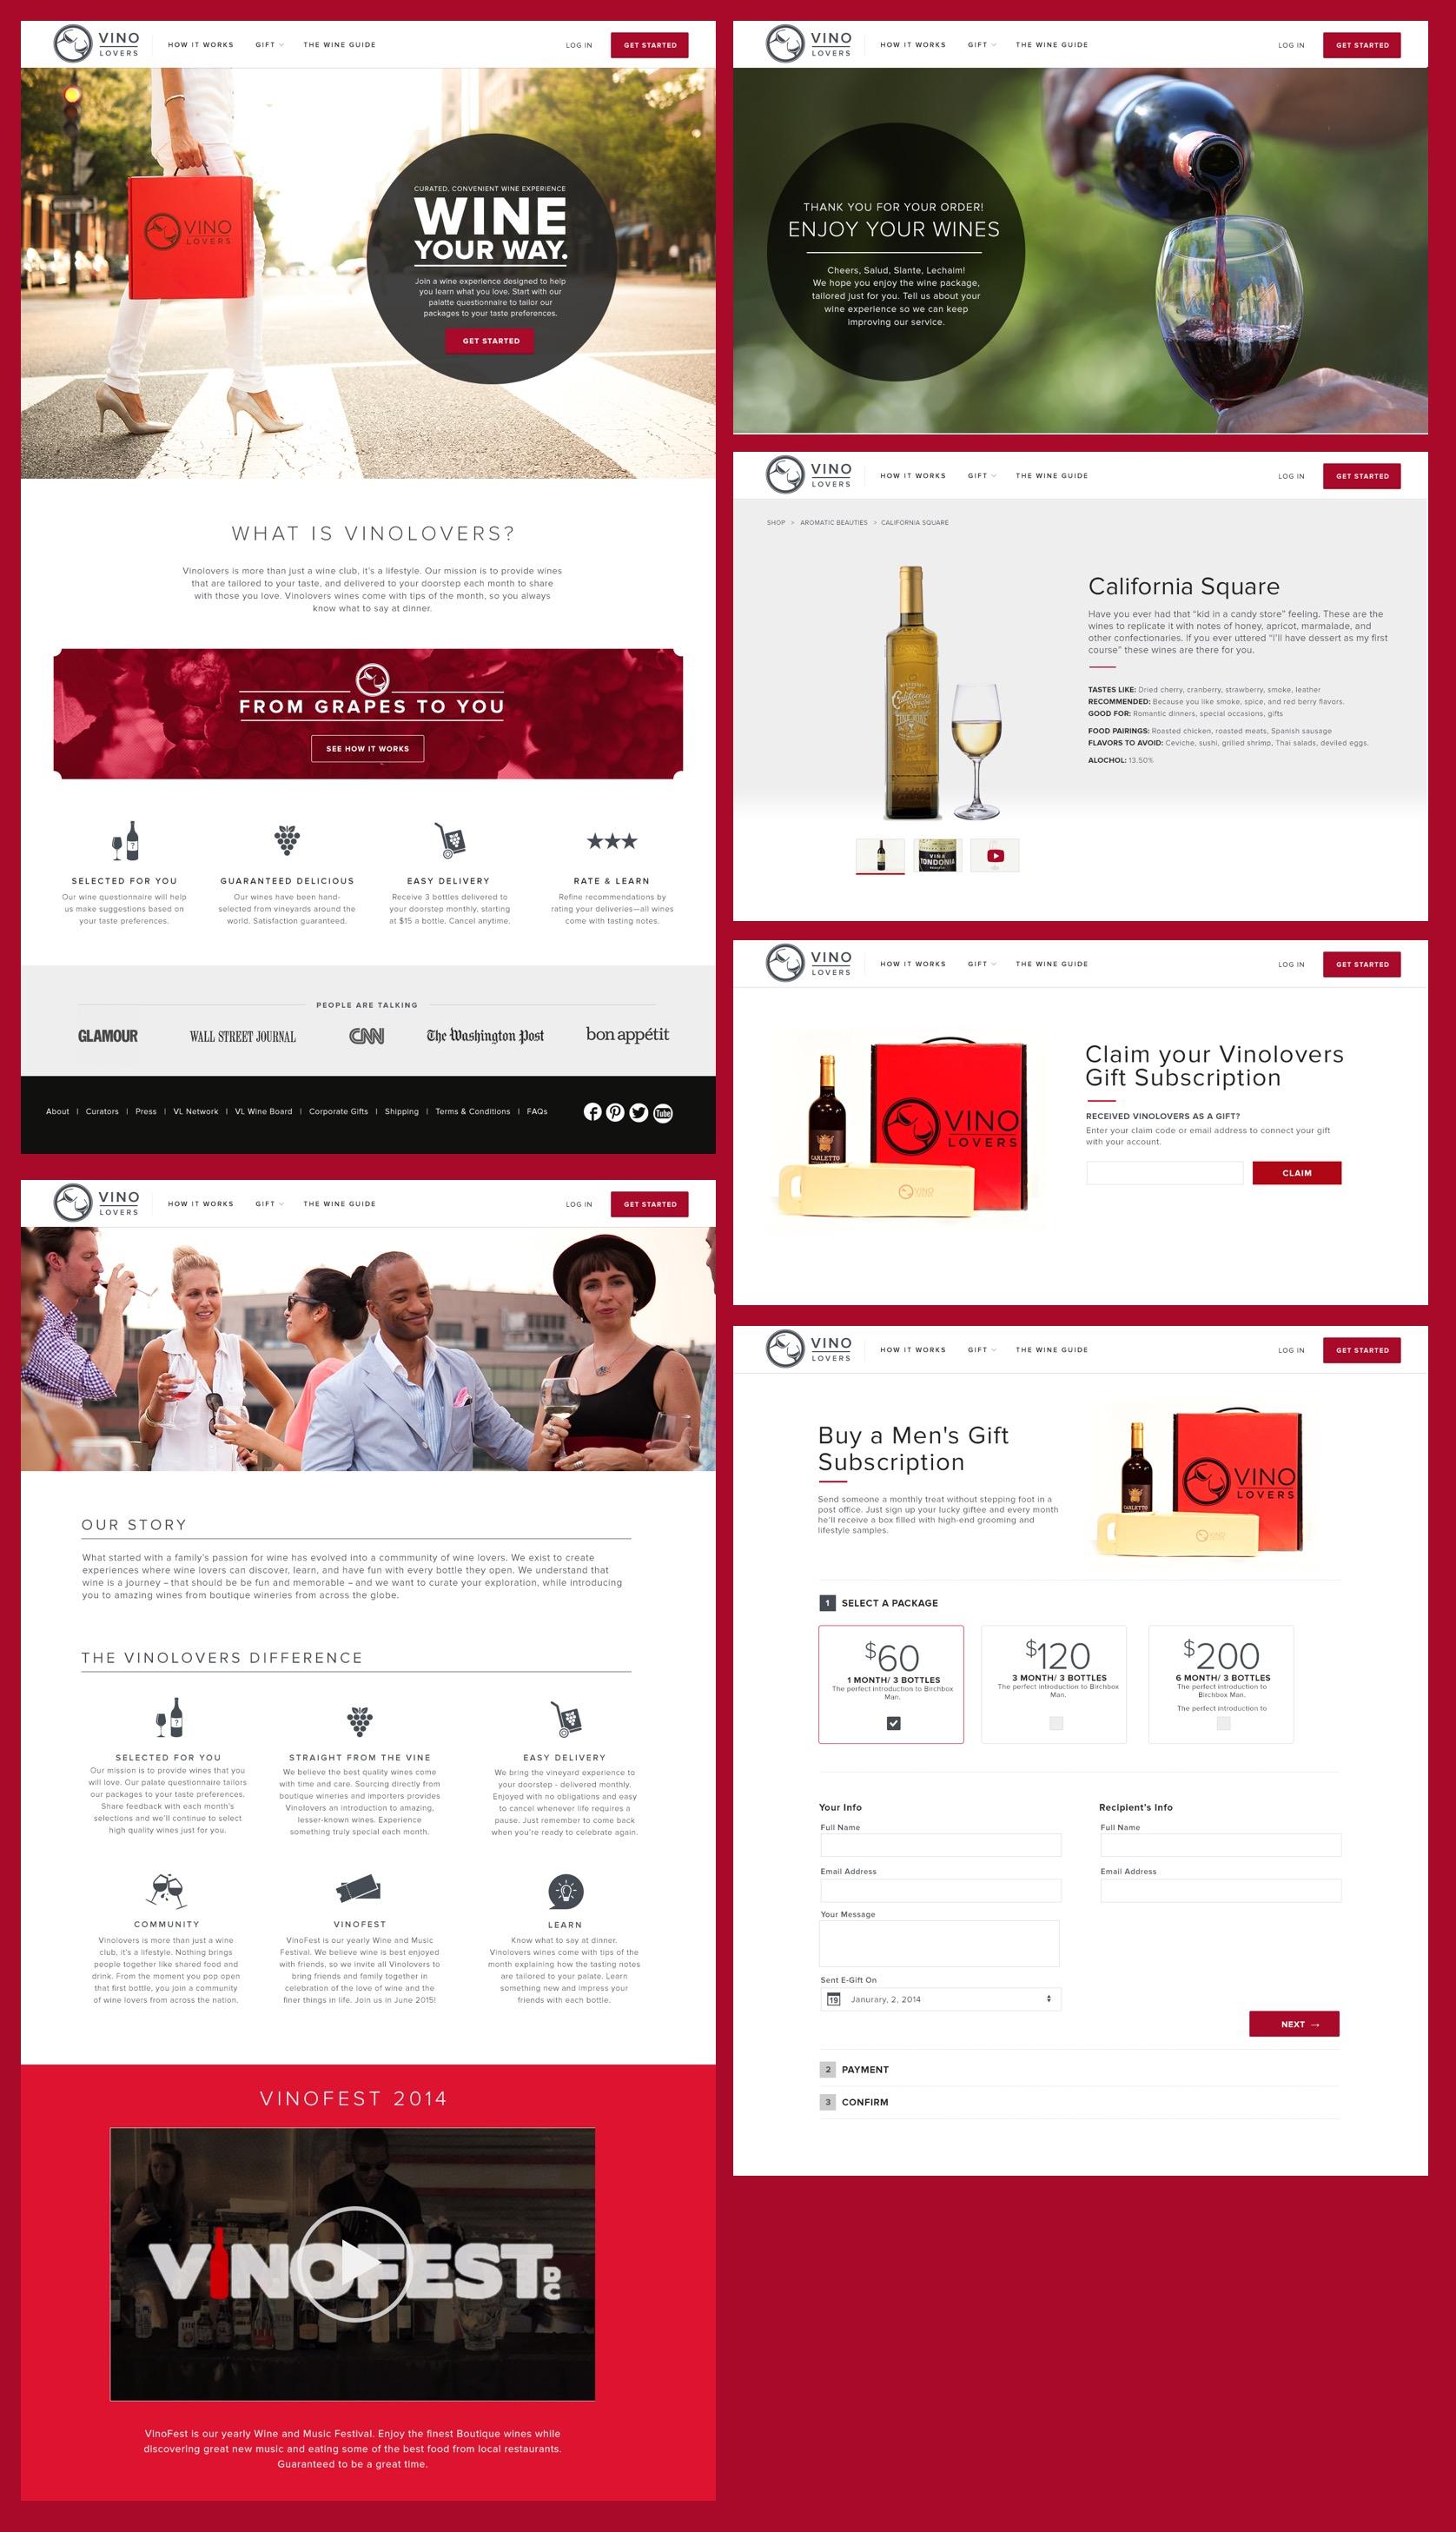 Screenshots of the Vinolovers website